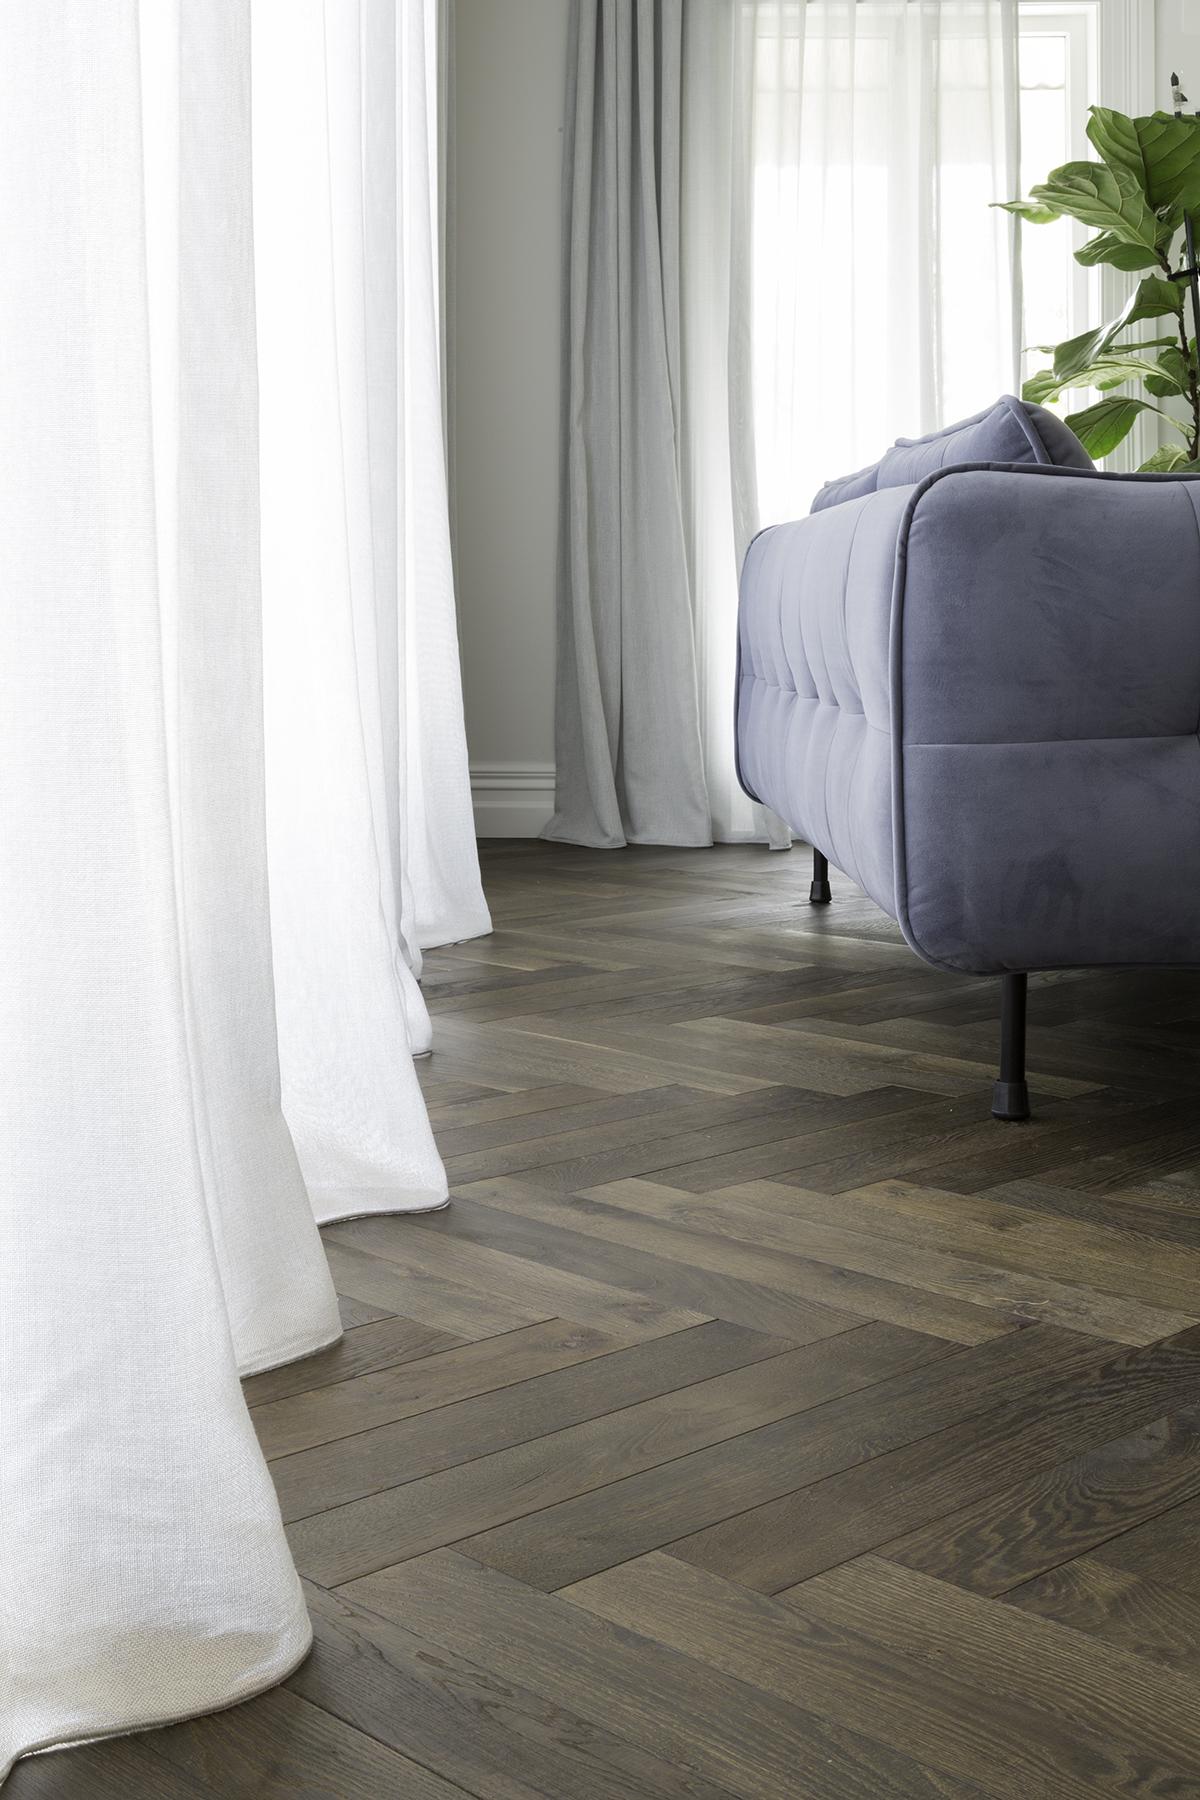 Marrone herring bone timber flooring